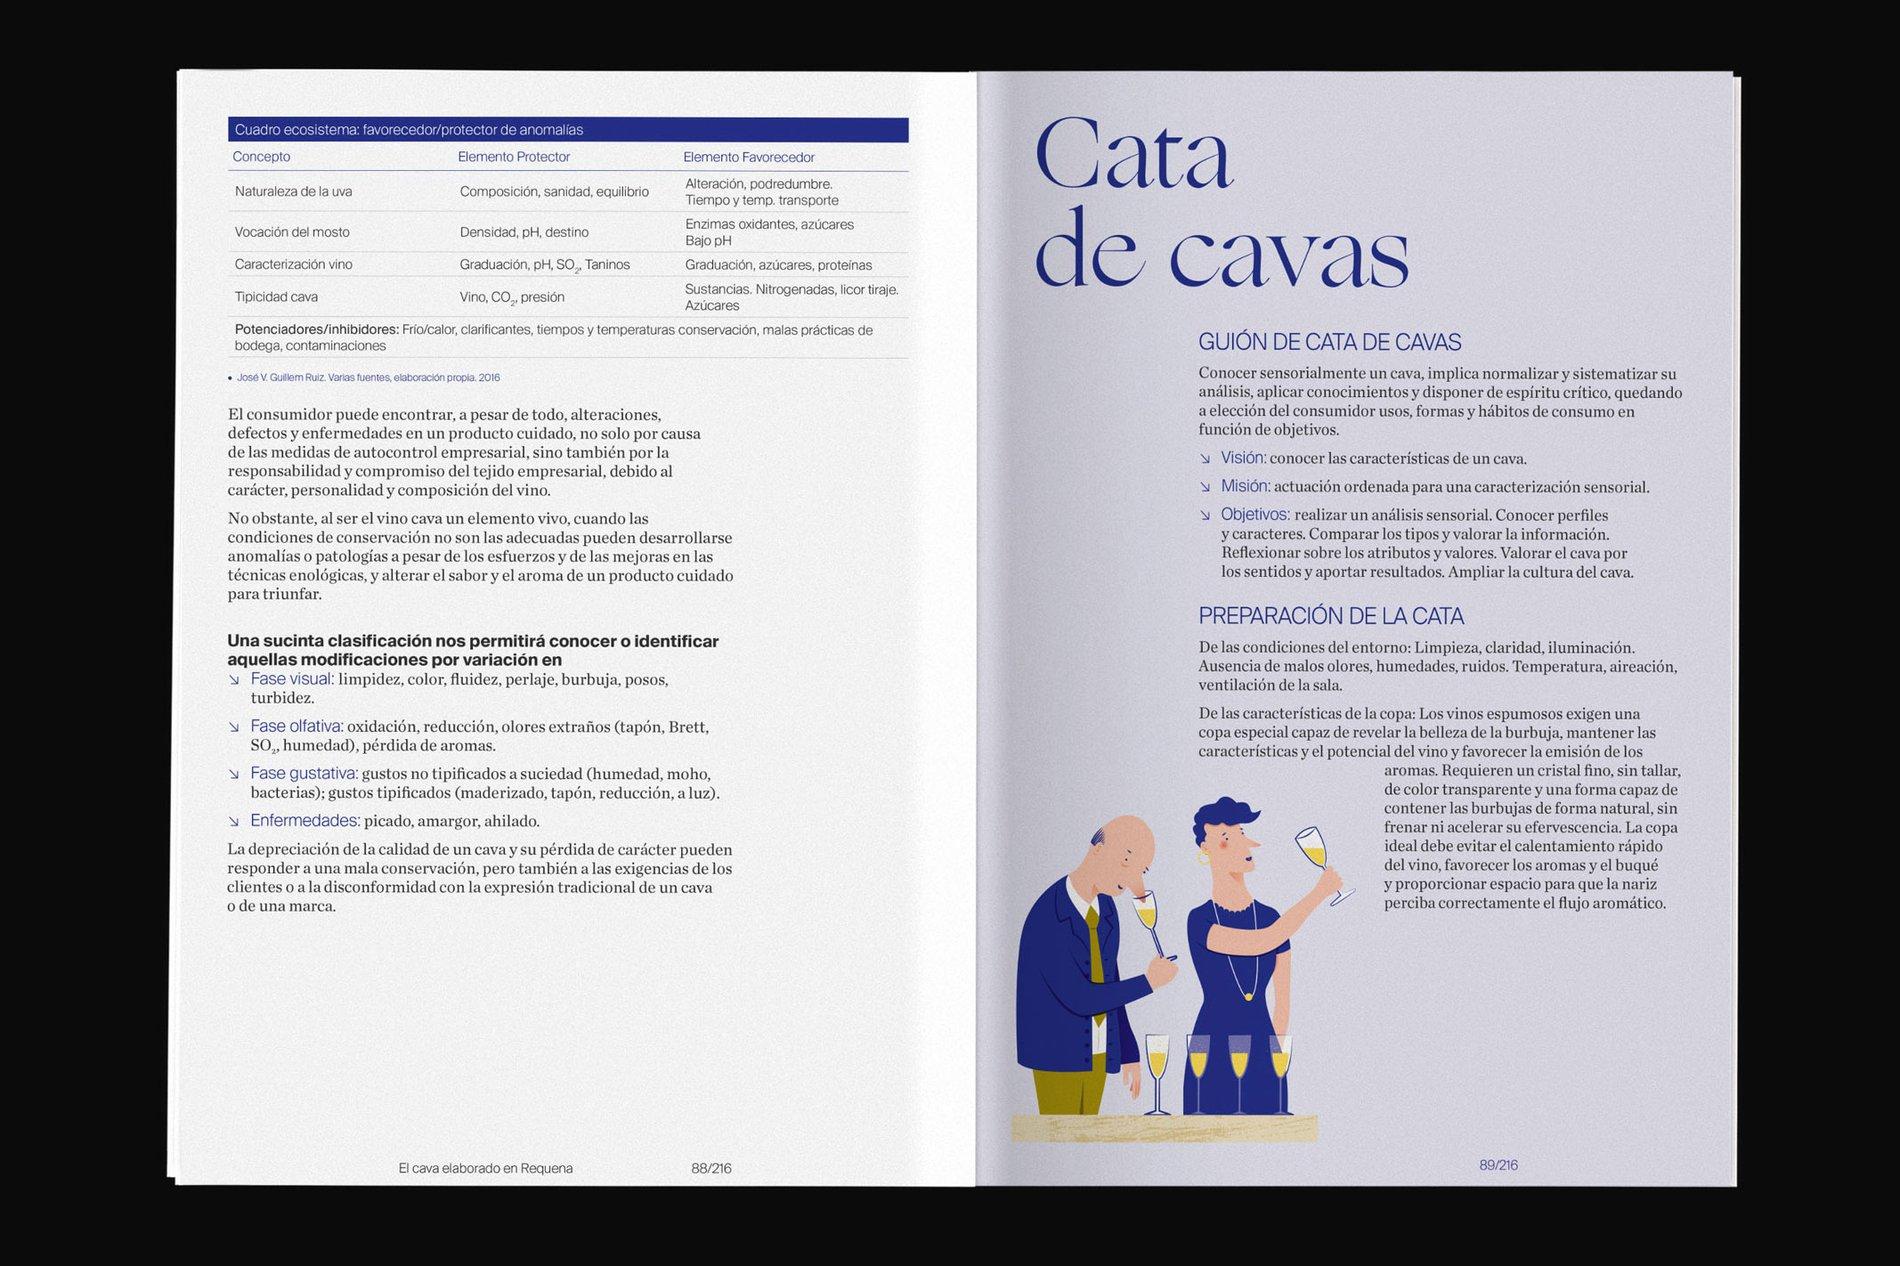 Cava-Ogg-4.1.jpg